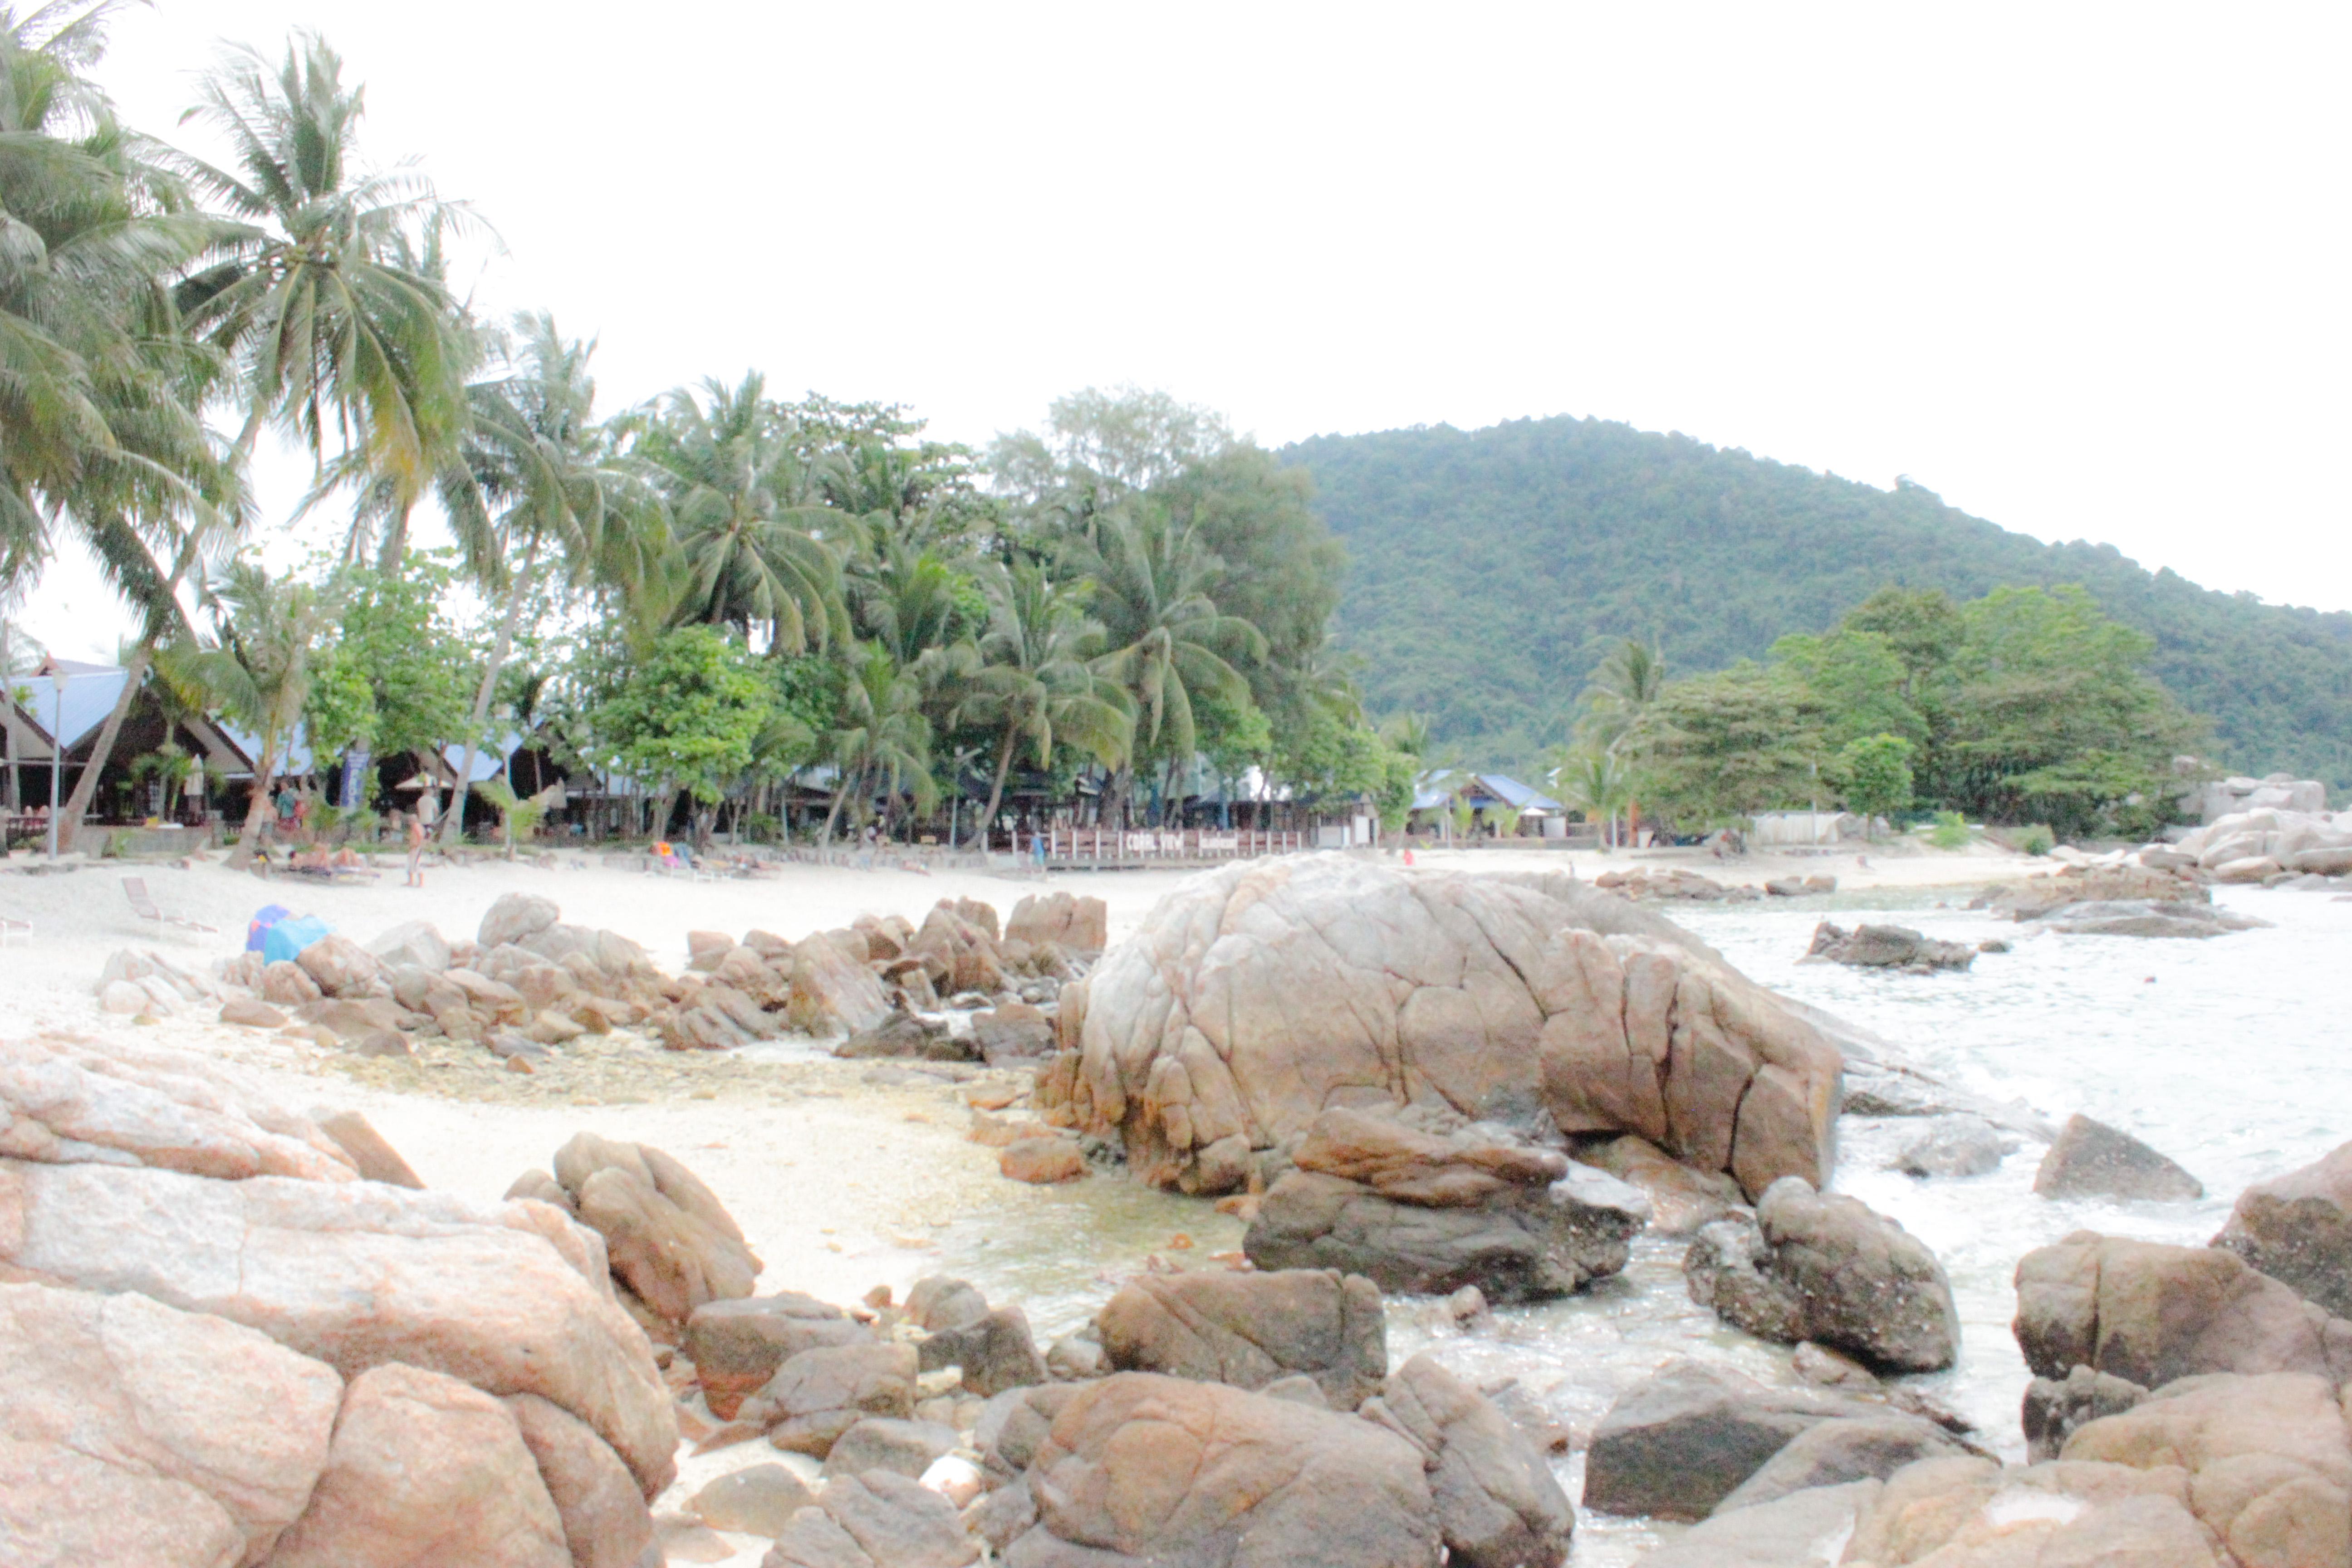 Image de la plage du Coral view island resort